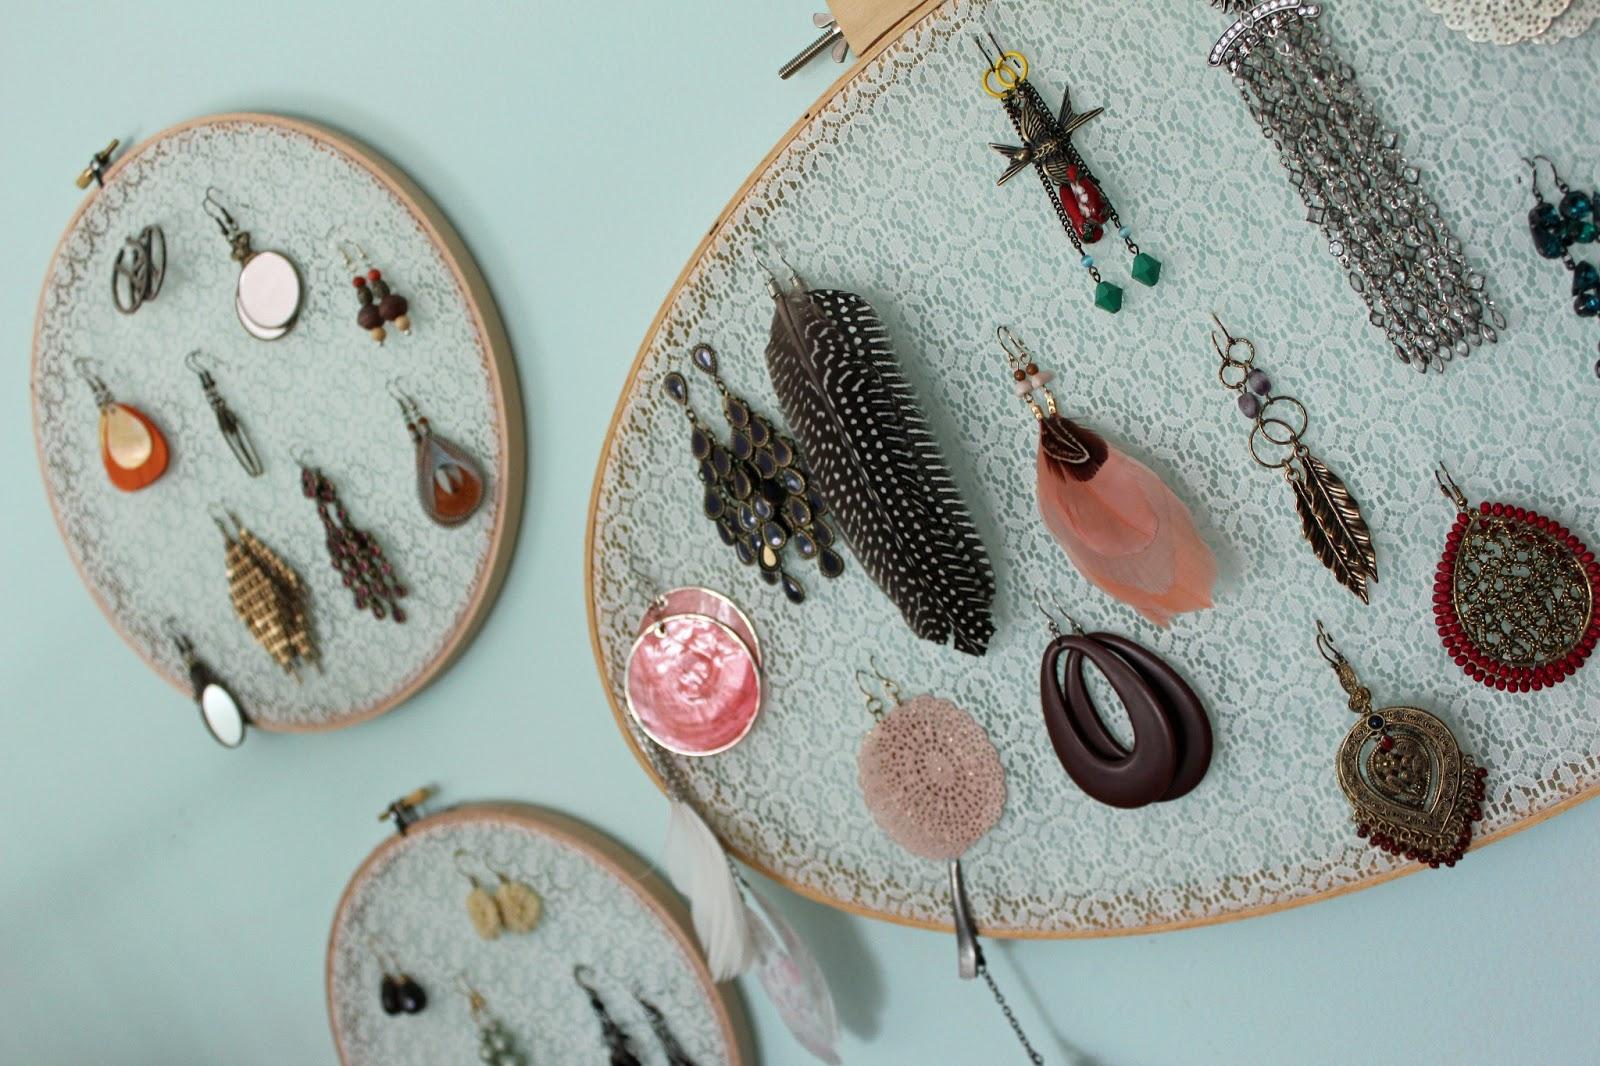 Dream Catcher Earring Holder DIY Embroidery Hoop Earring Holder Crafthubs 19